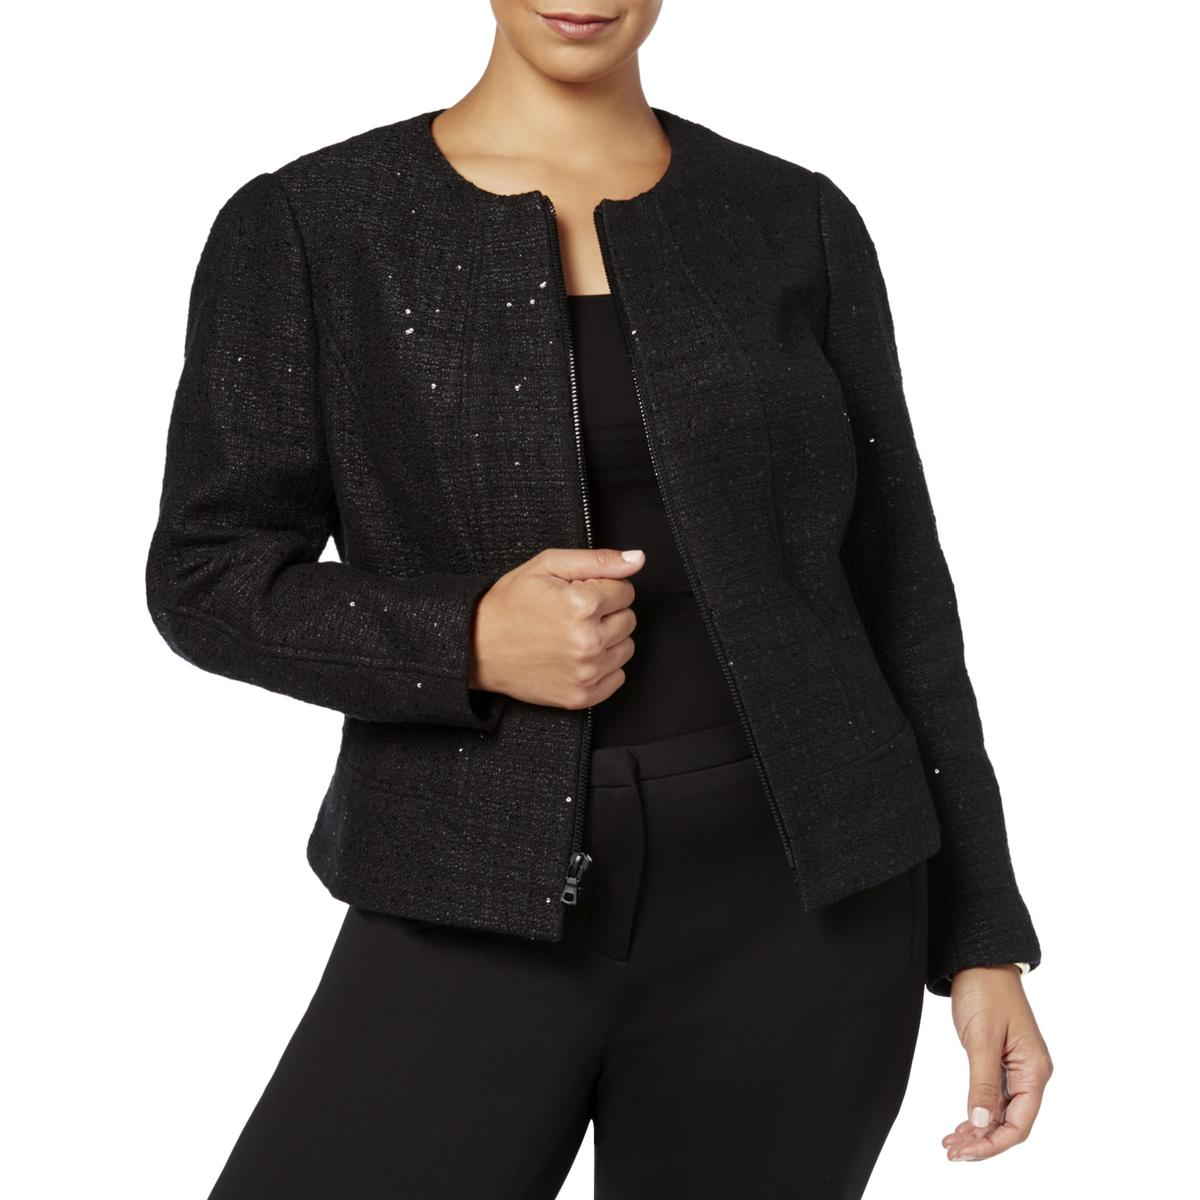 754e9f7219f Details about Anne Klein Womens Black Sequined Tweed Jacket Blazer Plus 20W  BHFO 1527